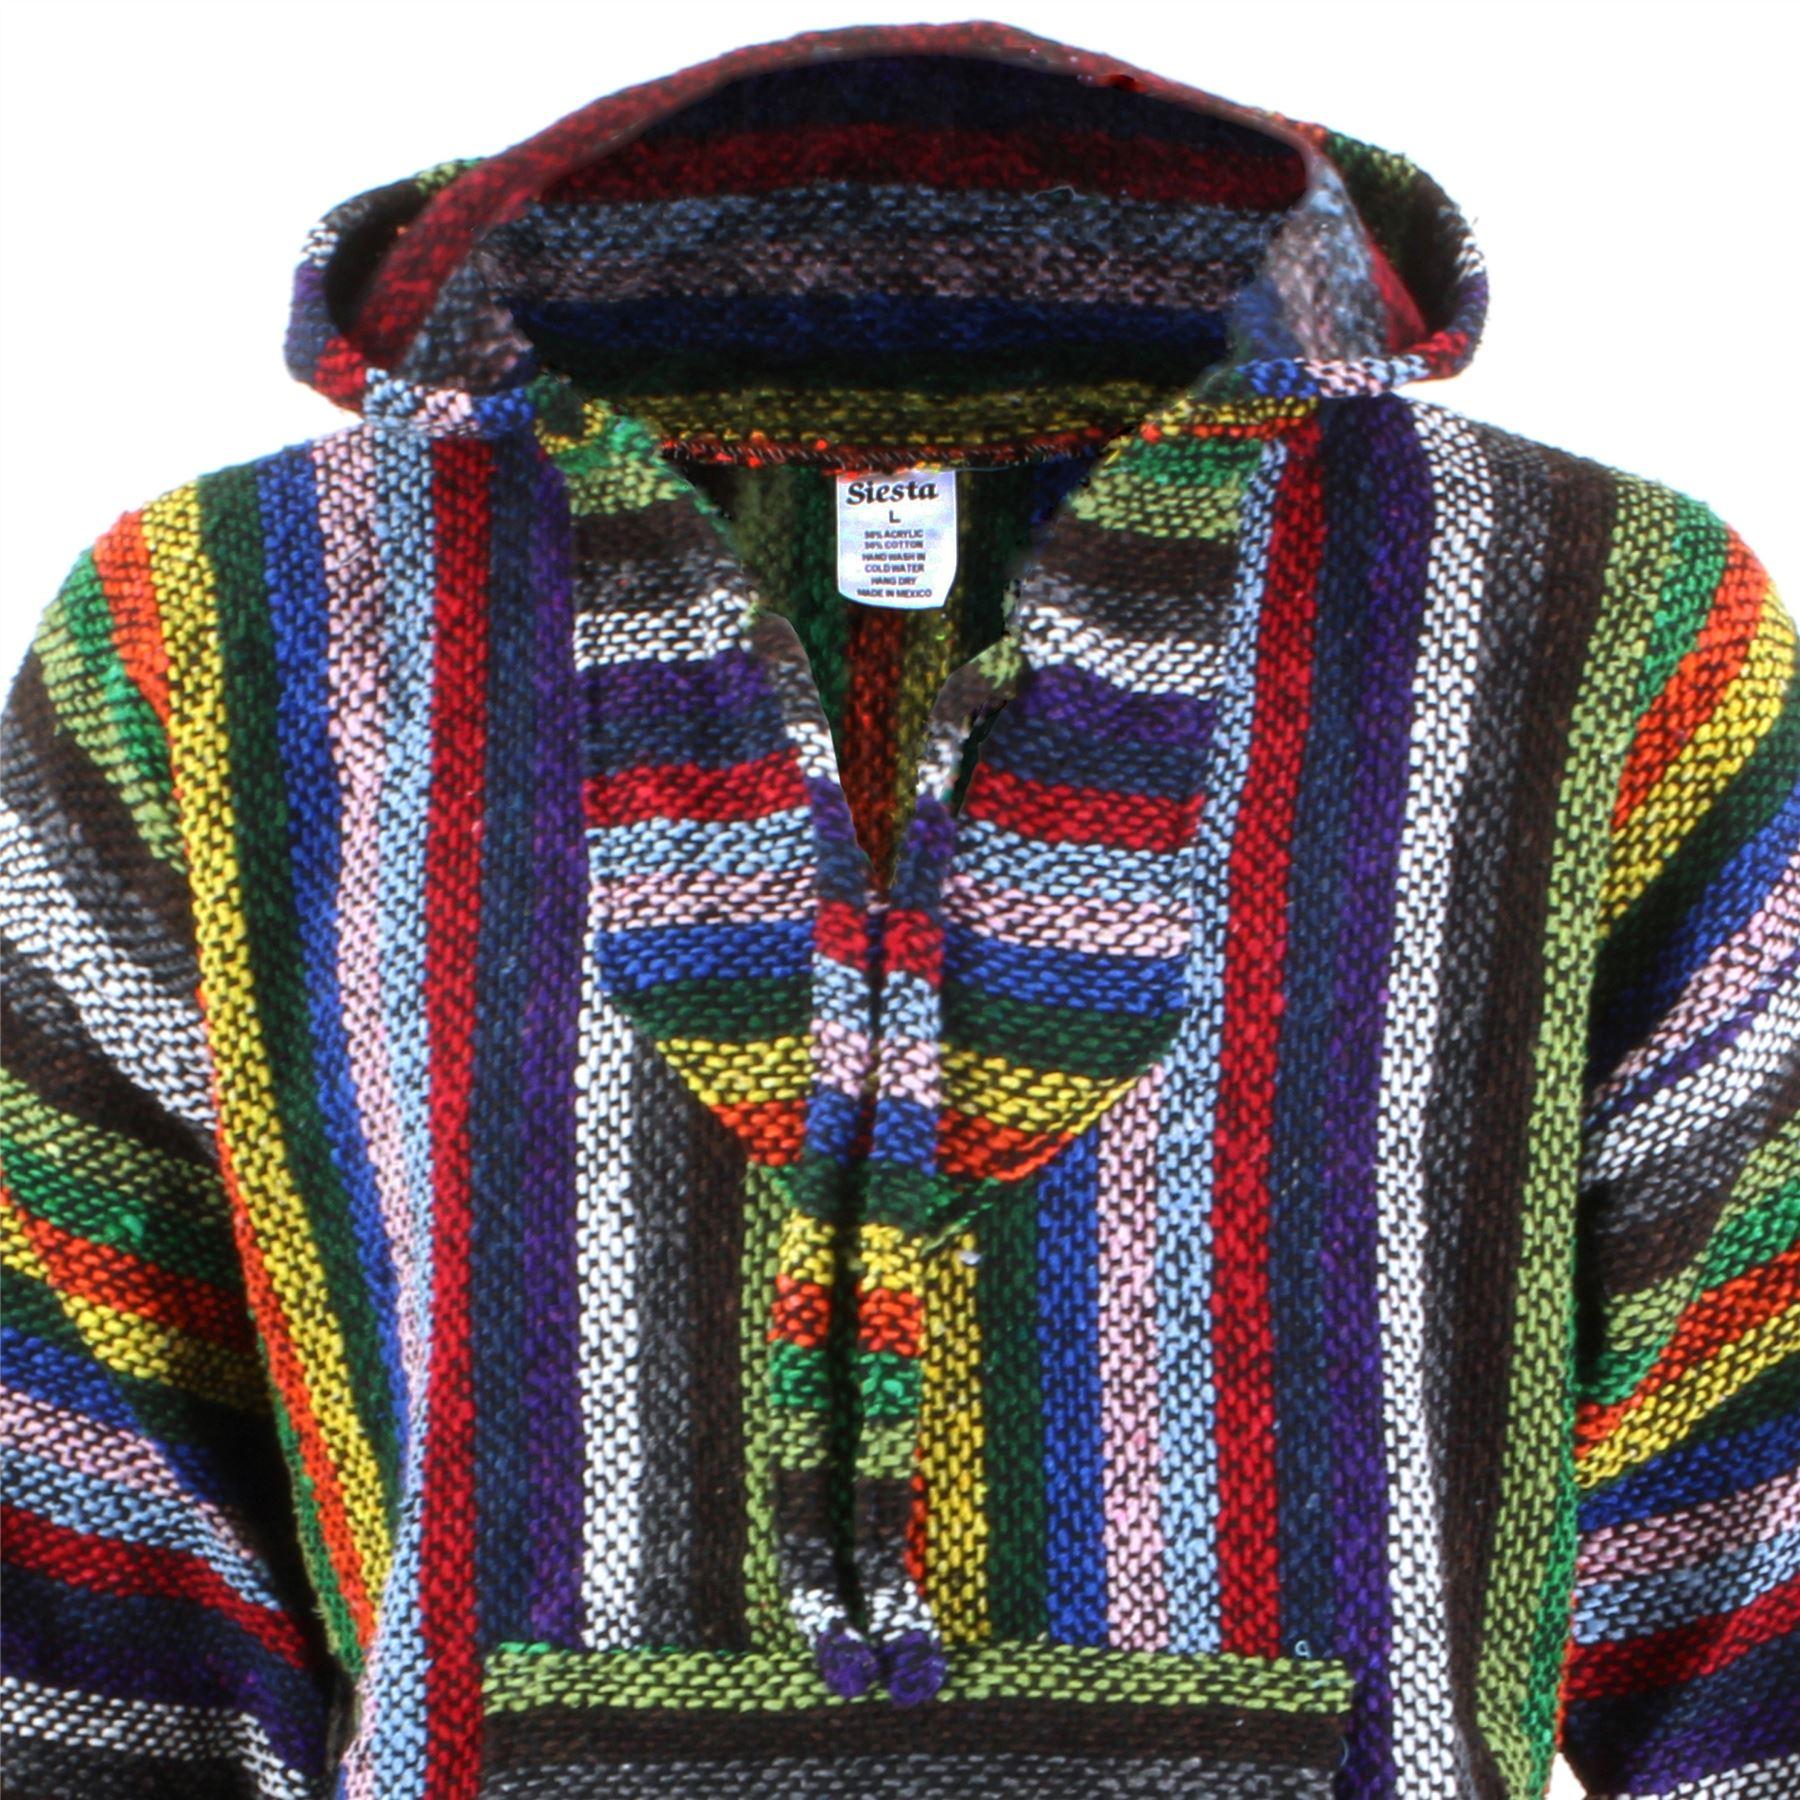 Mexican-Baja-Hoodie-Hoody-Jerga-Rug-Jumper-Siesta-Surf-Hippy-Baha-Pullover thumbnail 19